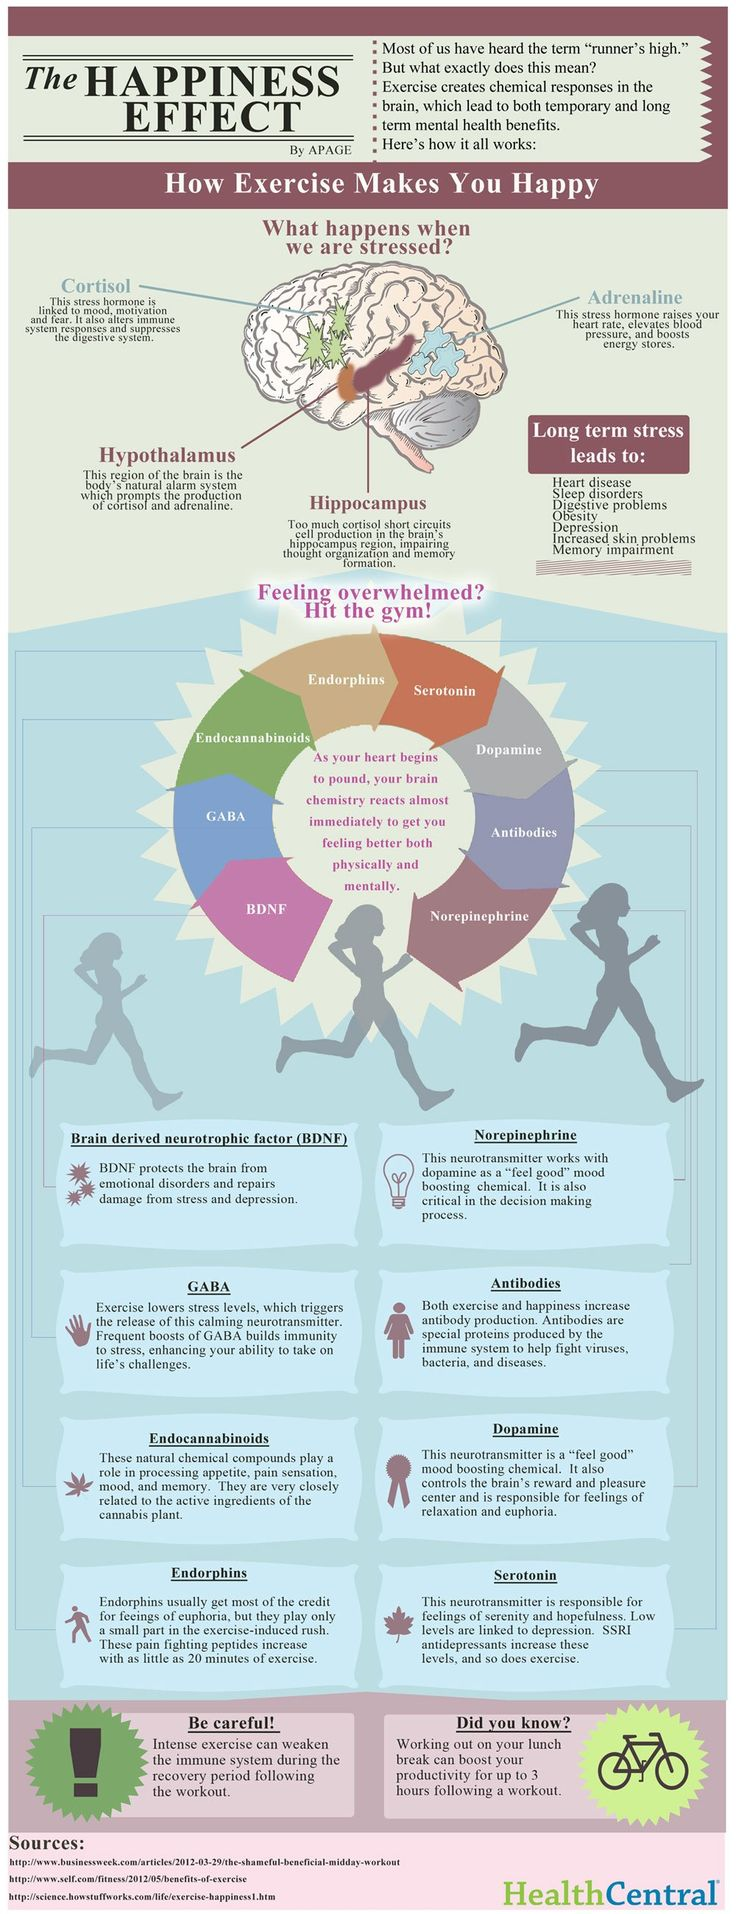 The #Happiness Effect. #brain #neuroscience #science #emotion #health #infographic #GABA #dopamine #norepinephrine #endorphins